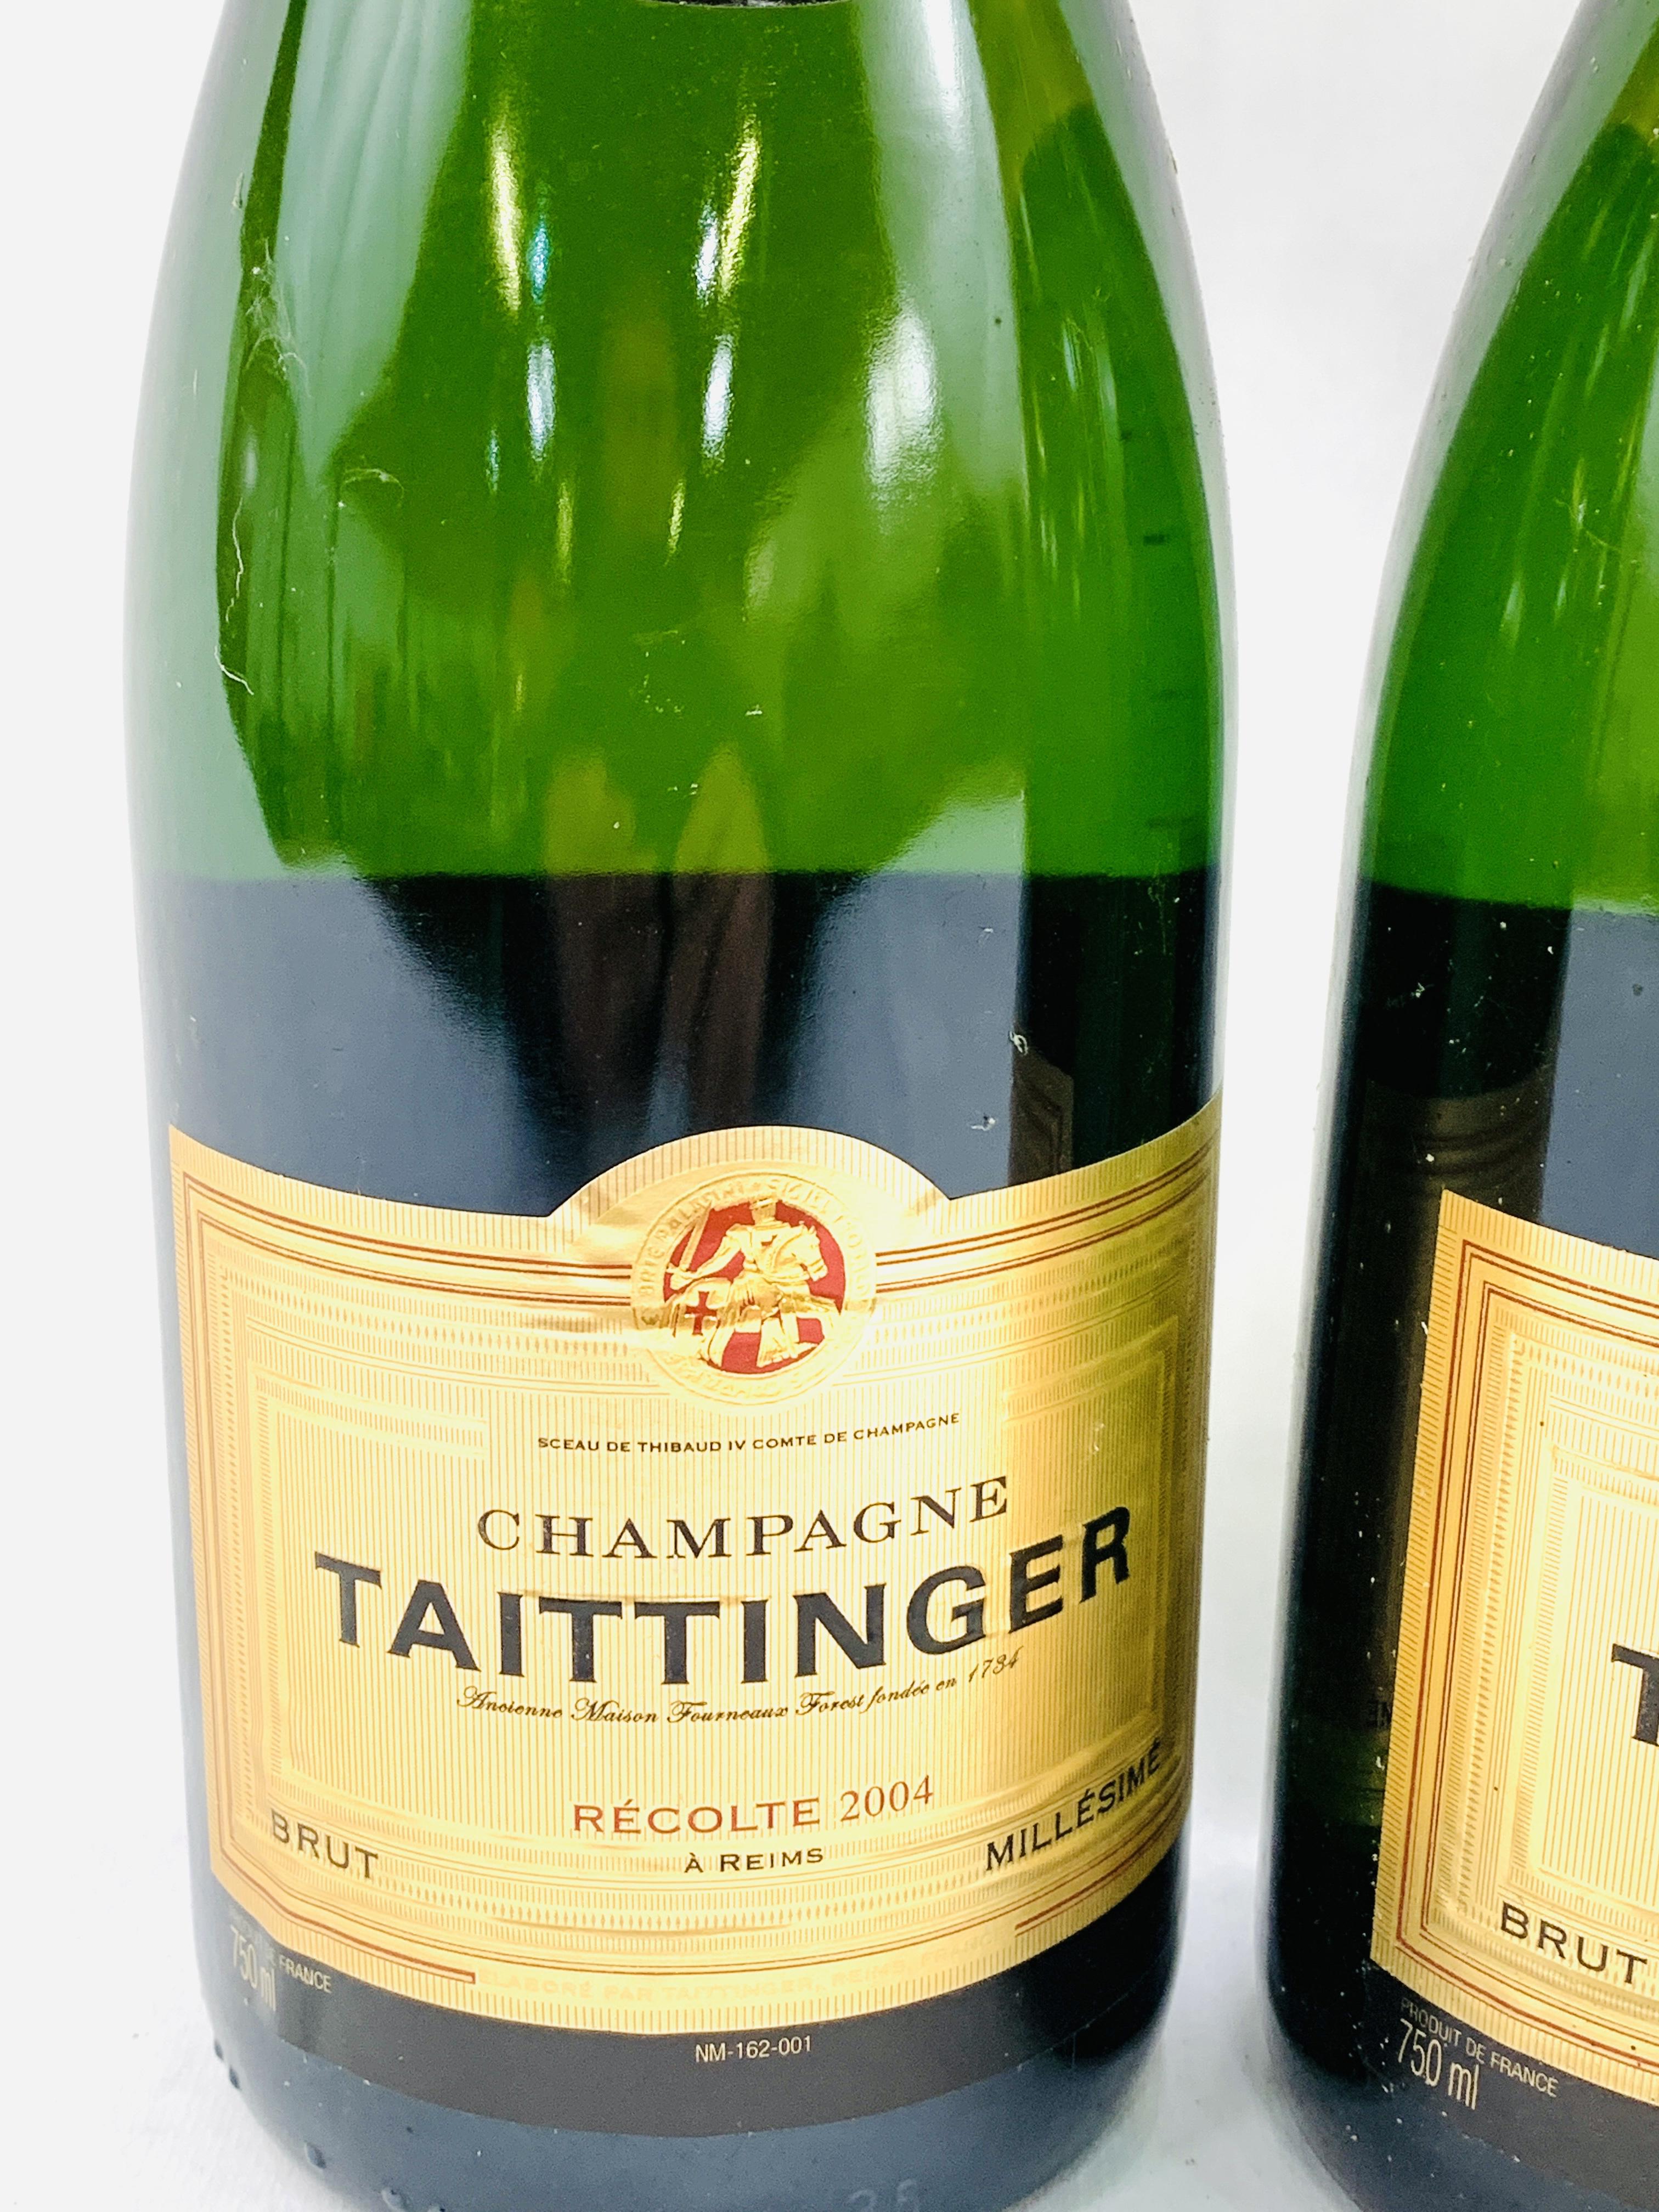 Two 75cl bottles of 2004 Taittinger Brut Millesime champagne - Image 3 of 3